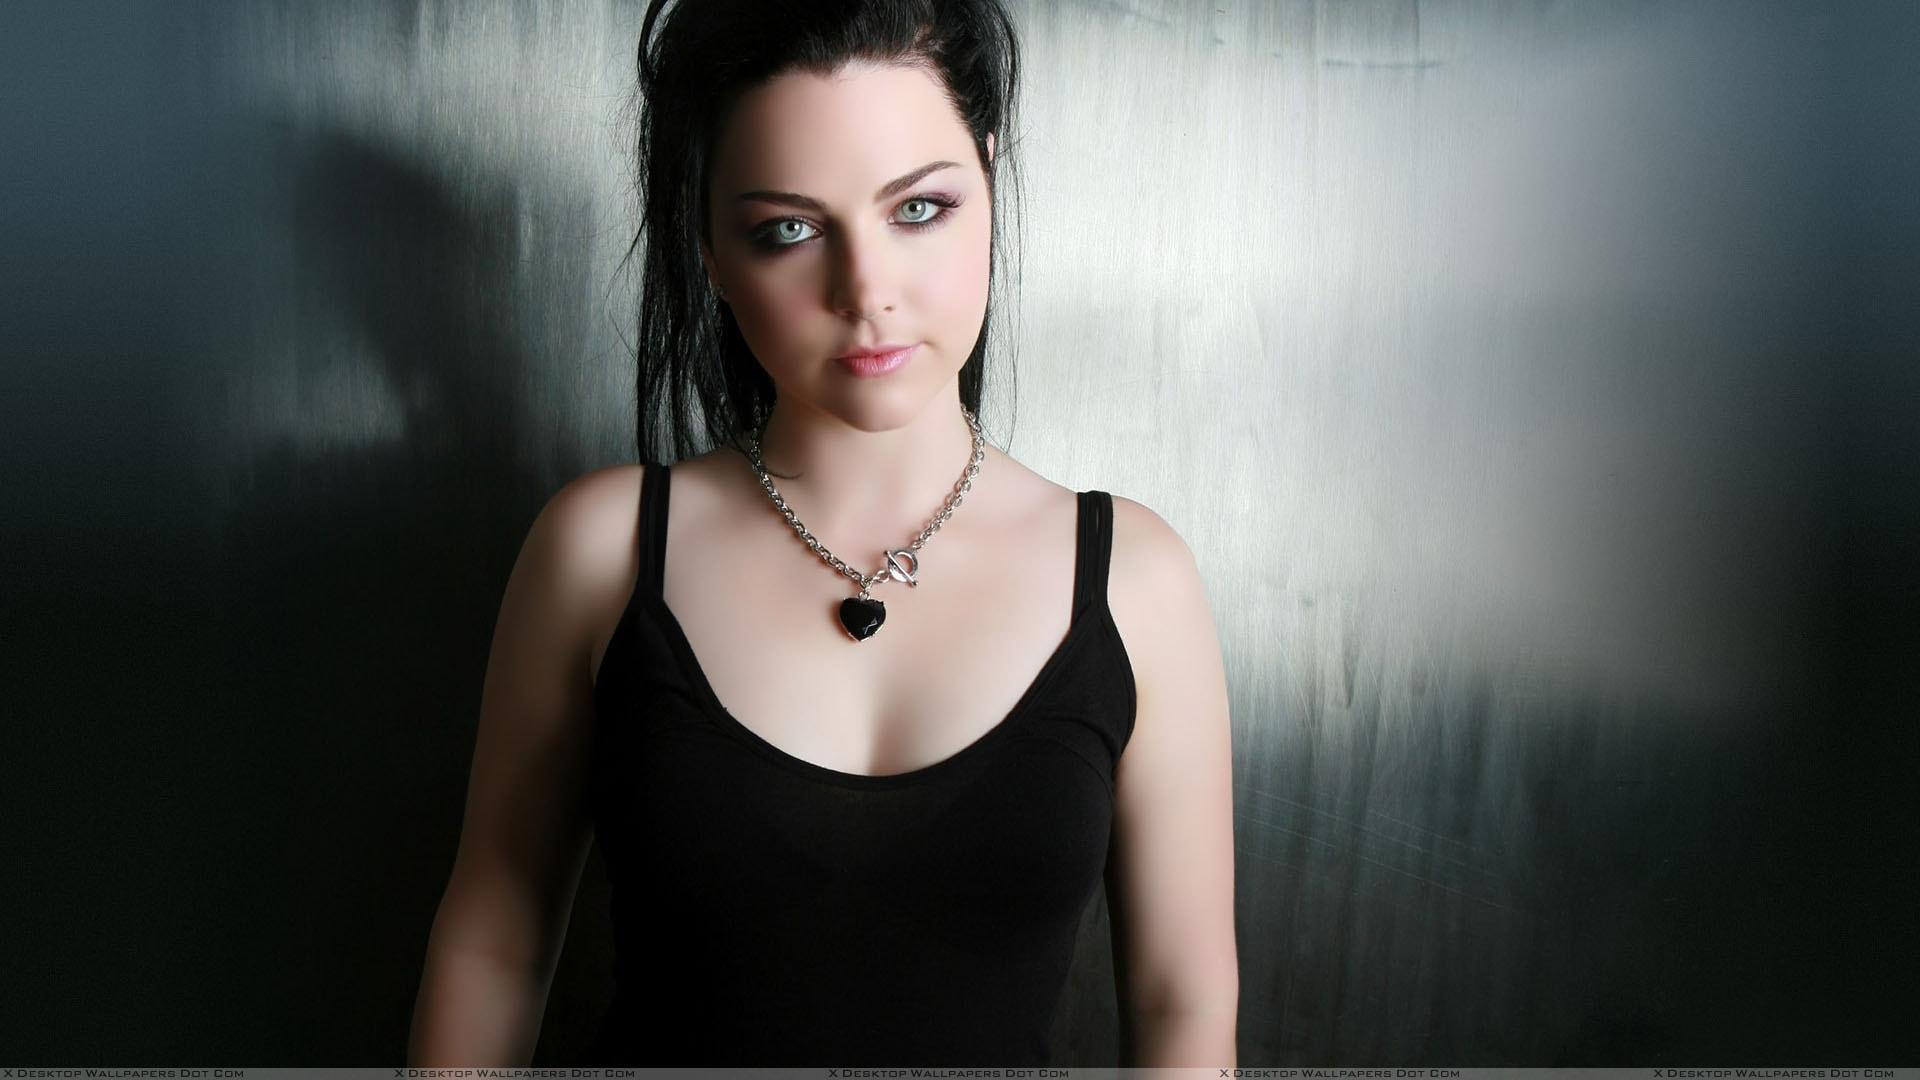 Amy Lee HD